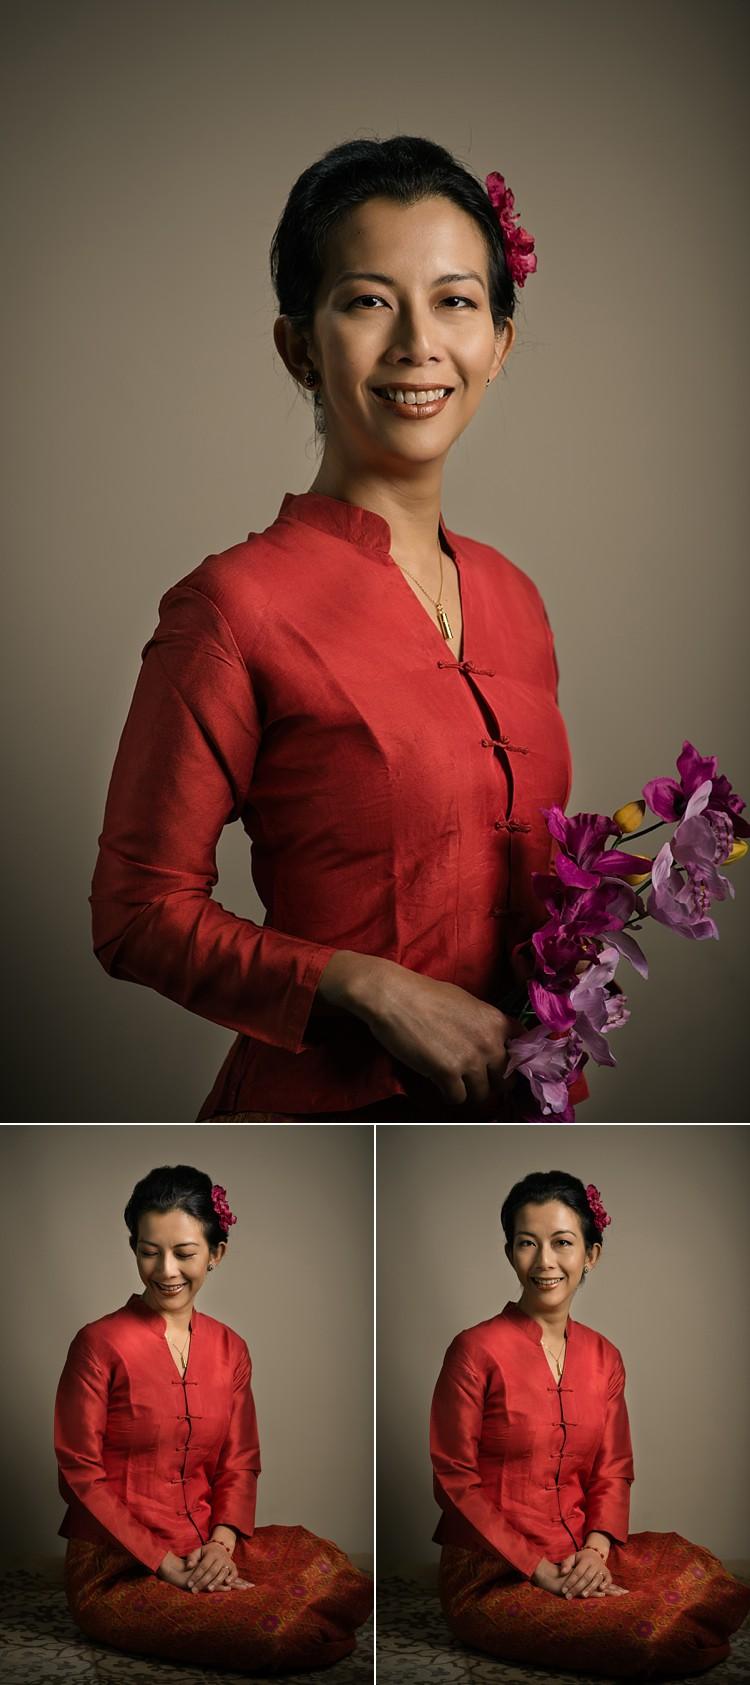 traditional dramatic classic portrait photoshoot burmese traditional dress london studio L lily sawyer photo.jpg